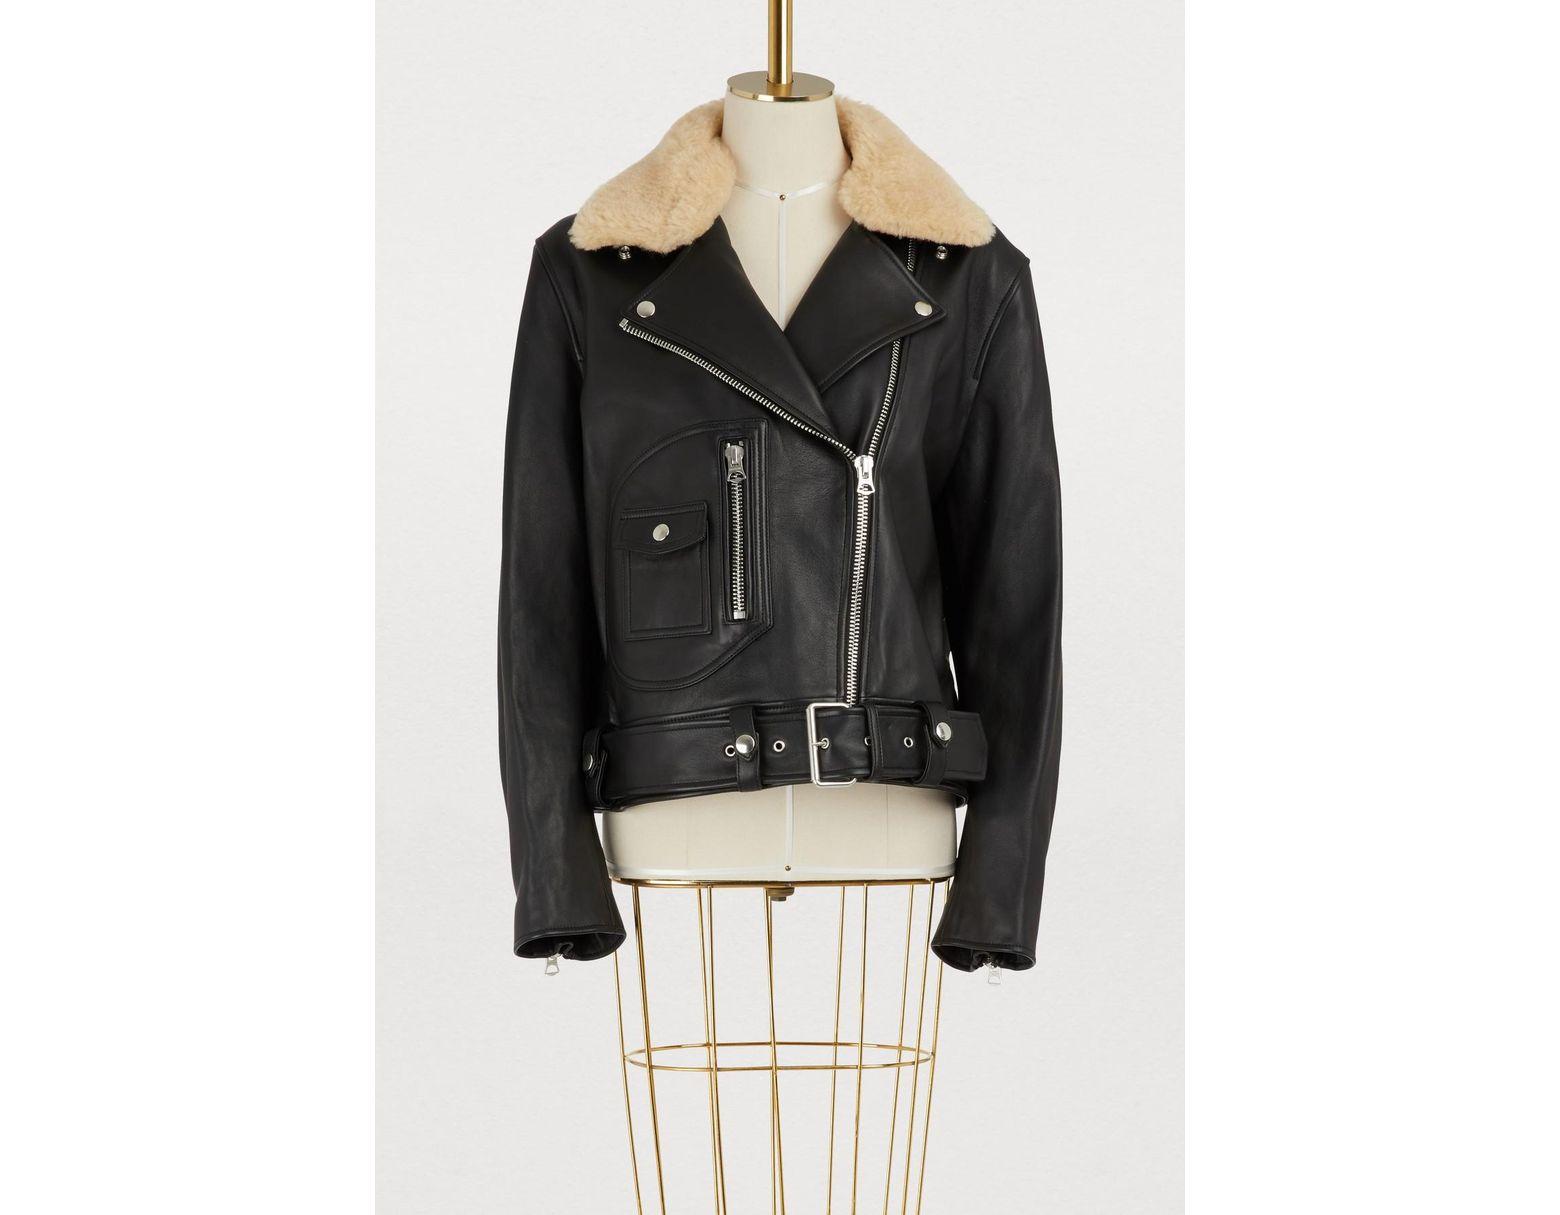 d92ac98b0 Women's Black Leather Biker Jacket With Fur Collar